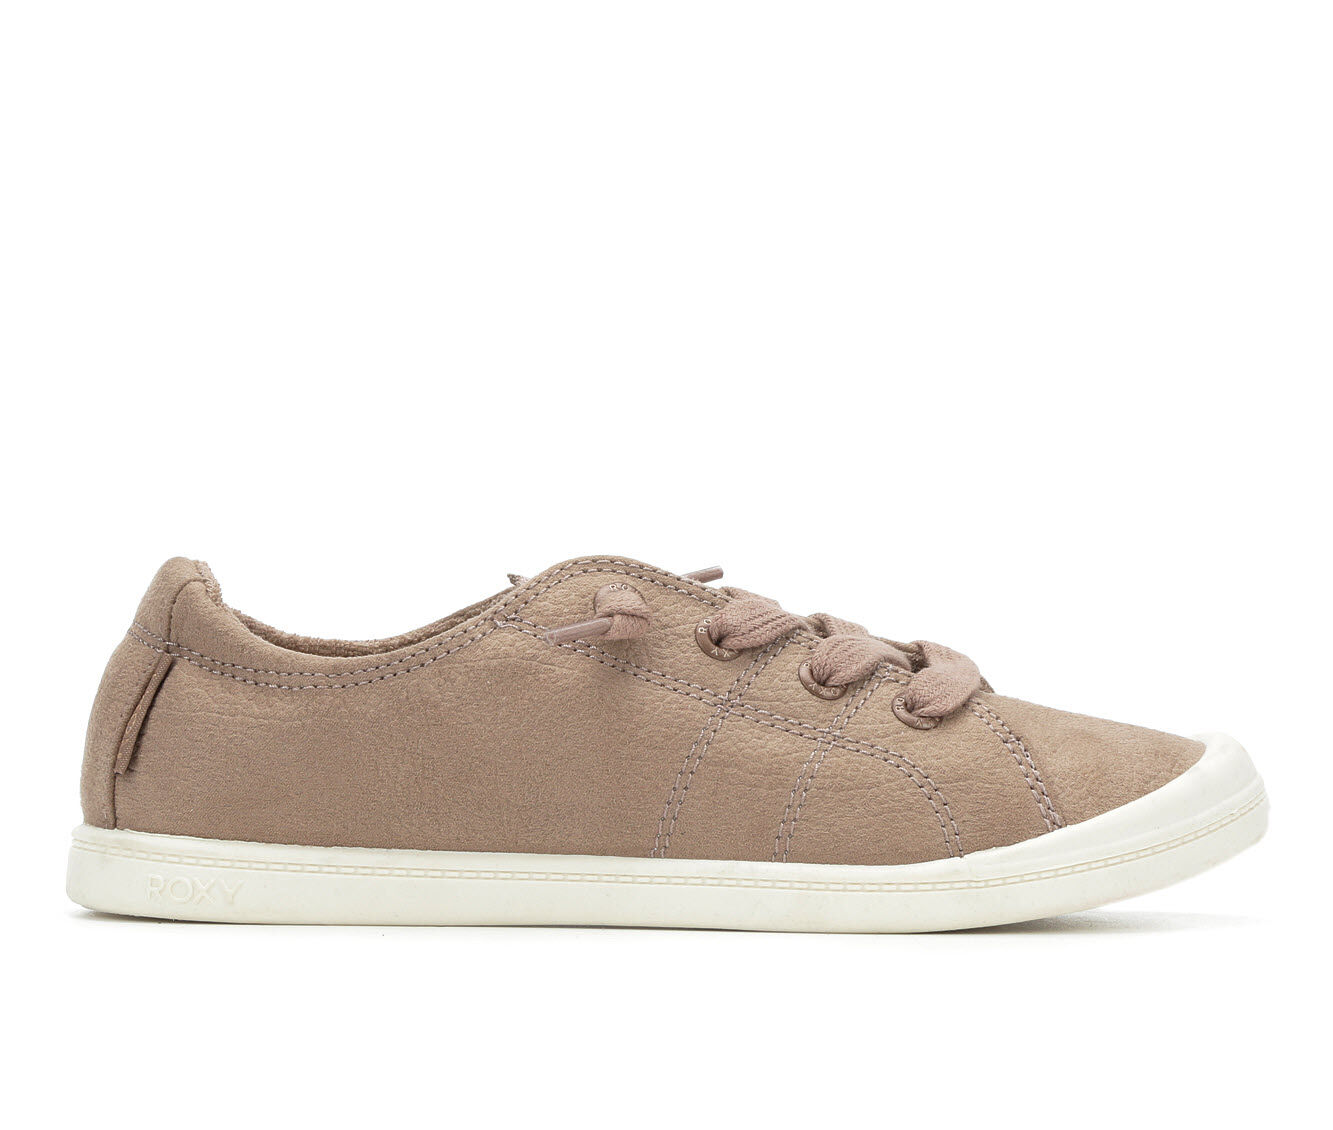 purchase comfortable Women's Roxy Bayshore Sneakers Granite Pebble